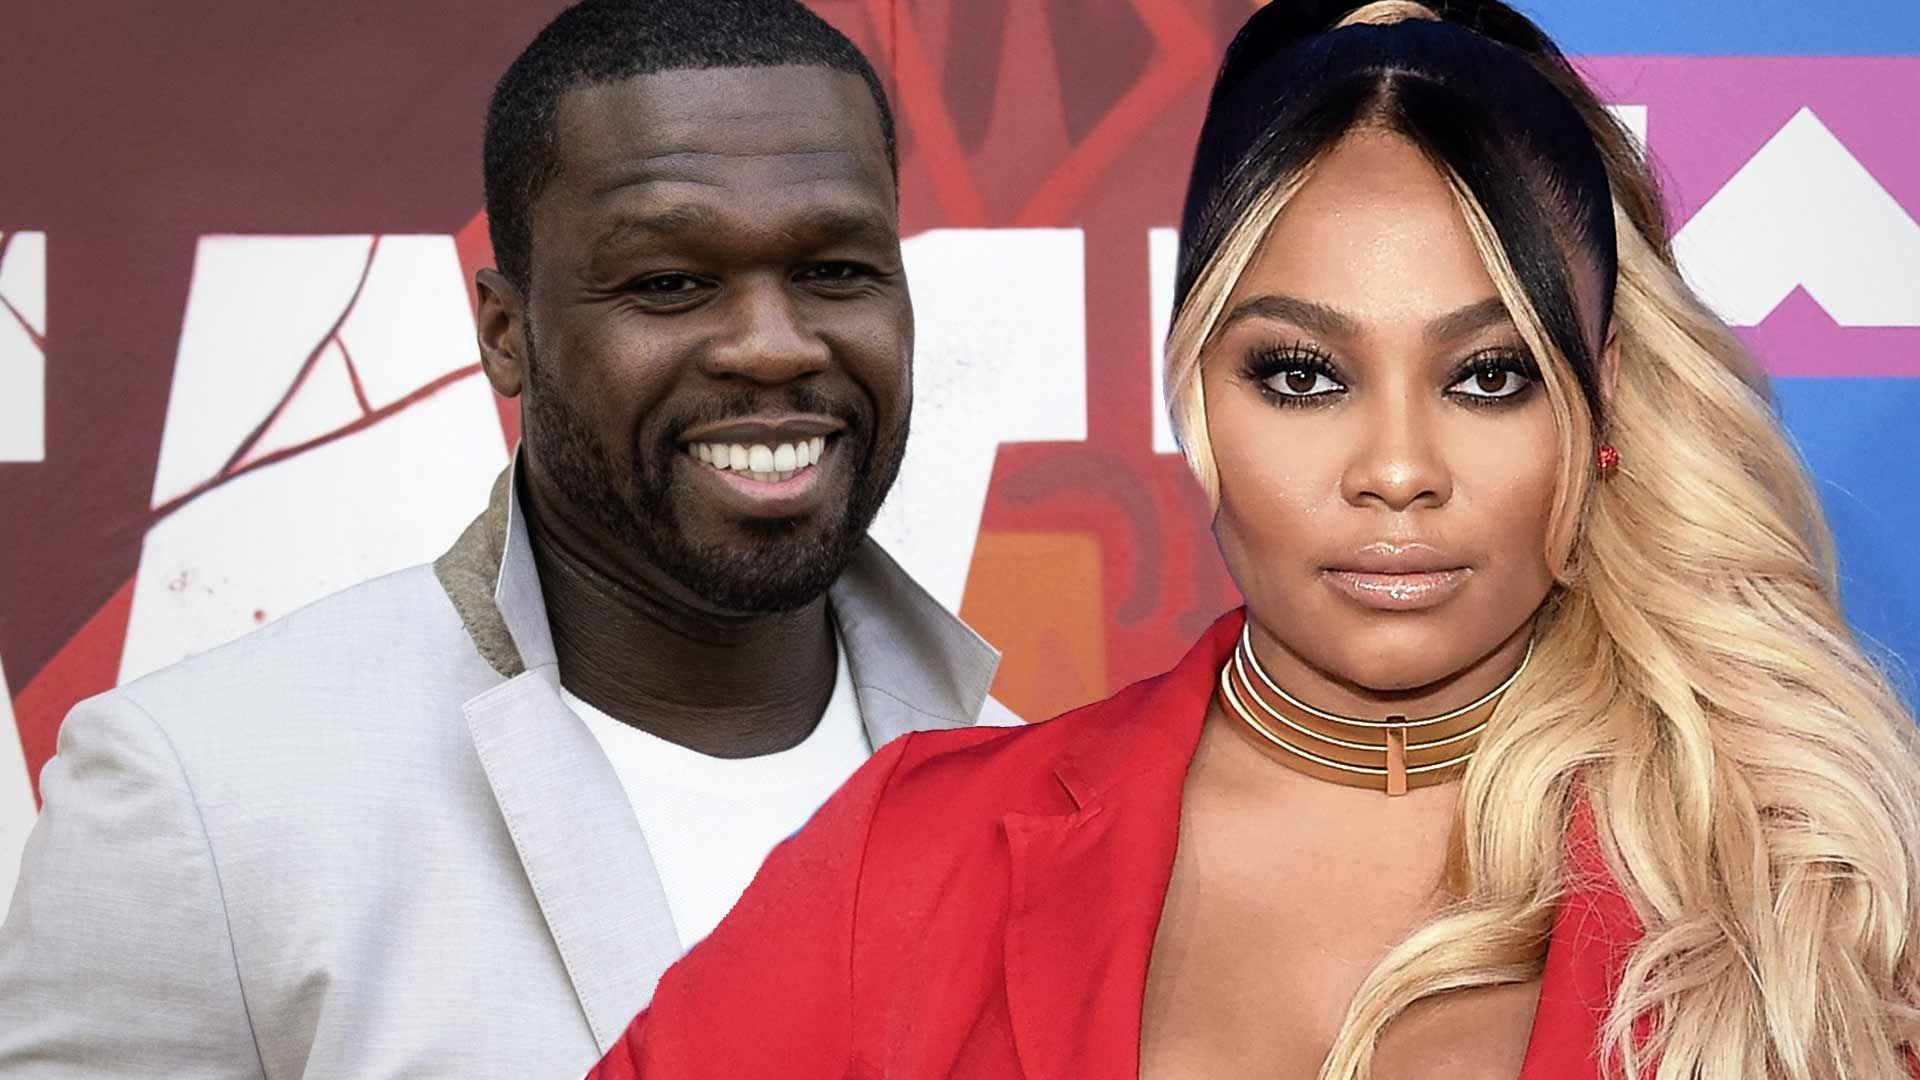 50 Cent Video Porno love & hip hop' star teairra mari accuses 50 cent of